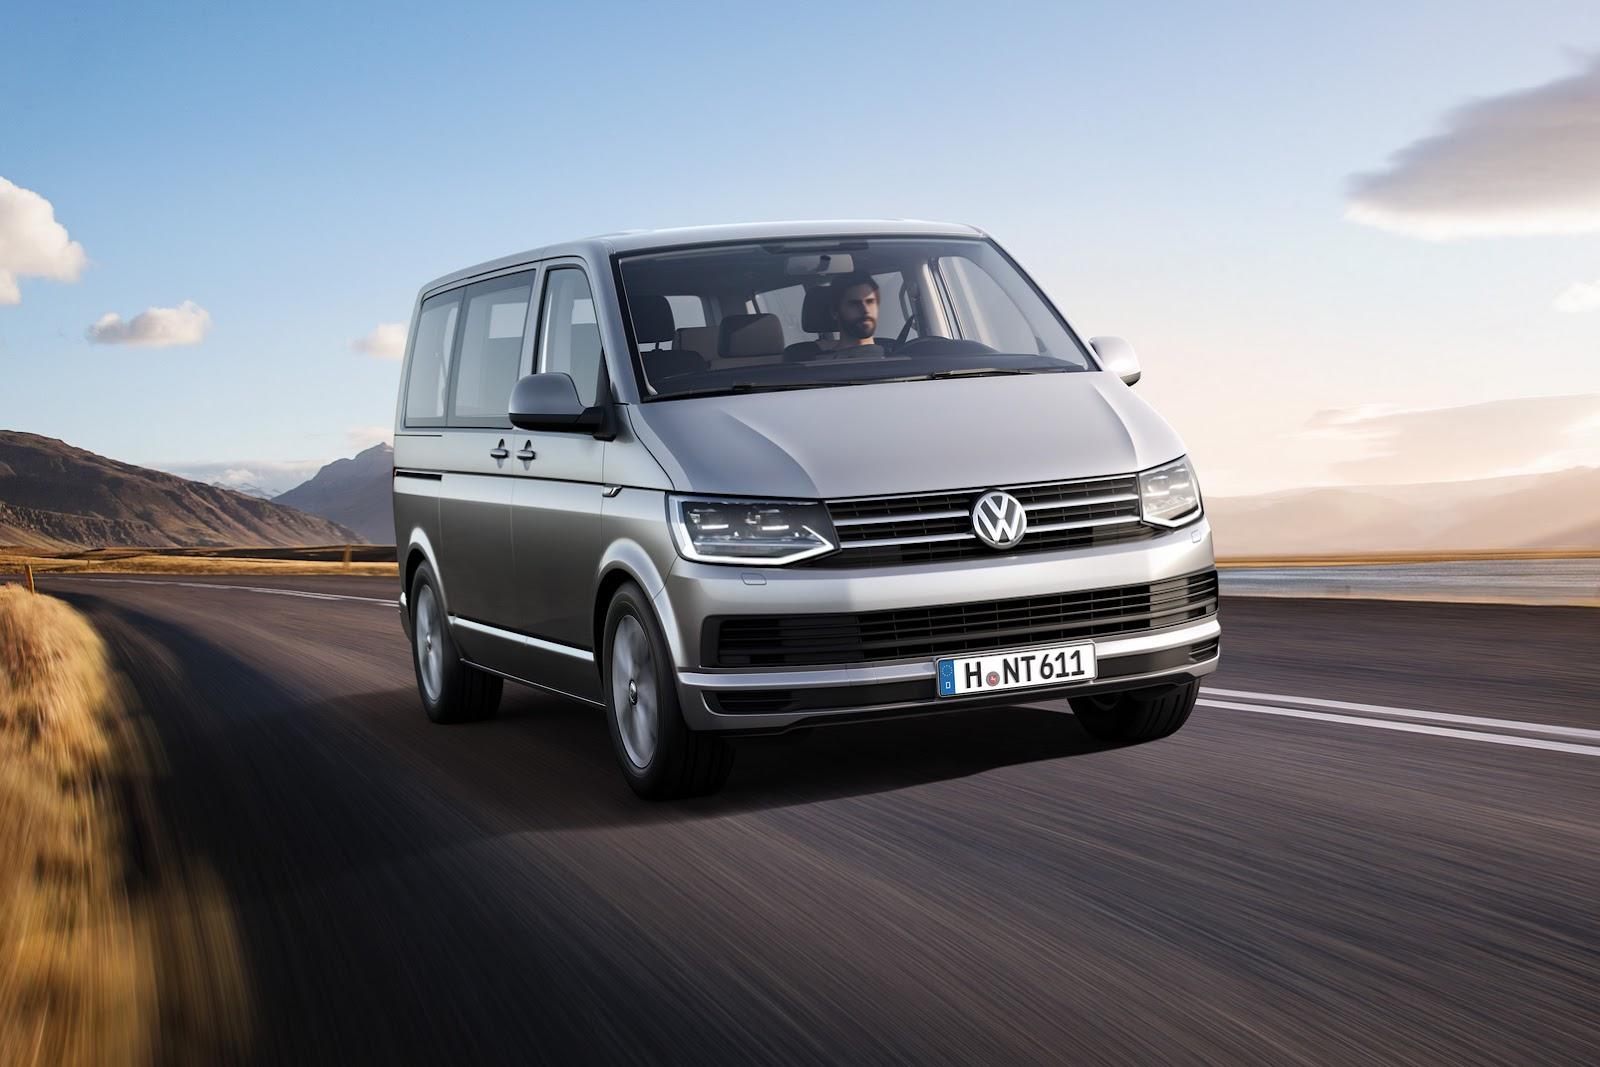 Volkswagen t4 caravelle transporter multivan